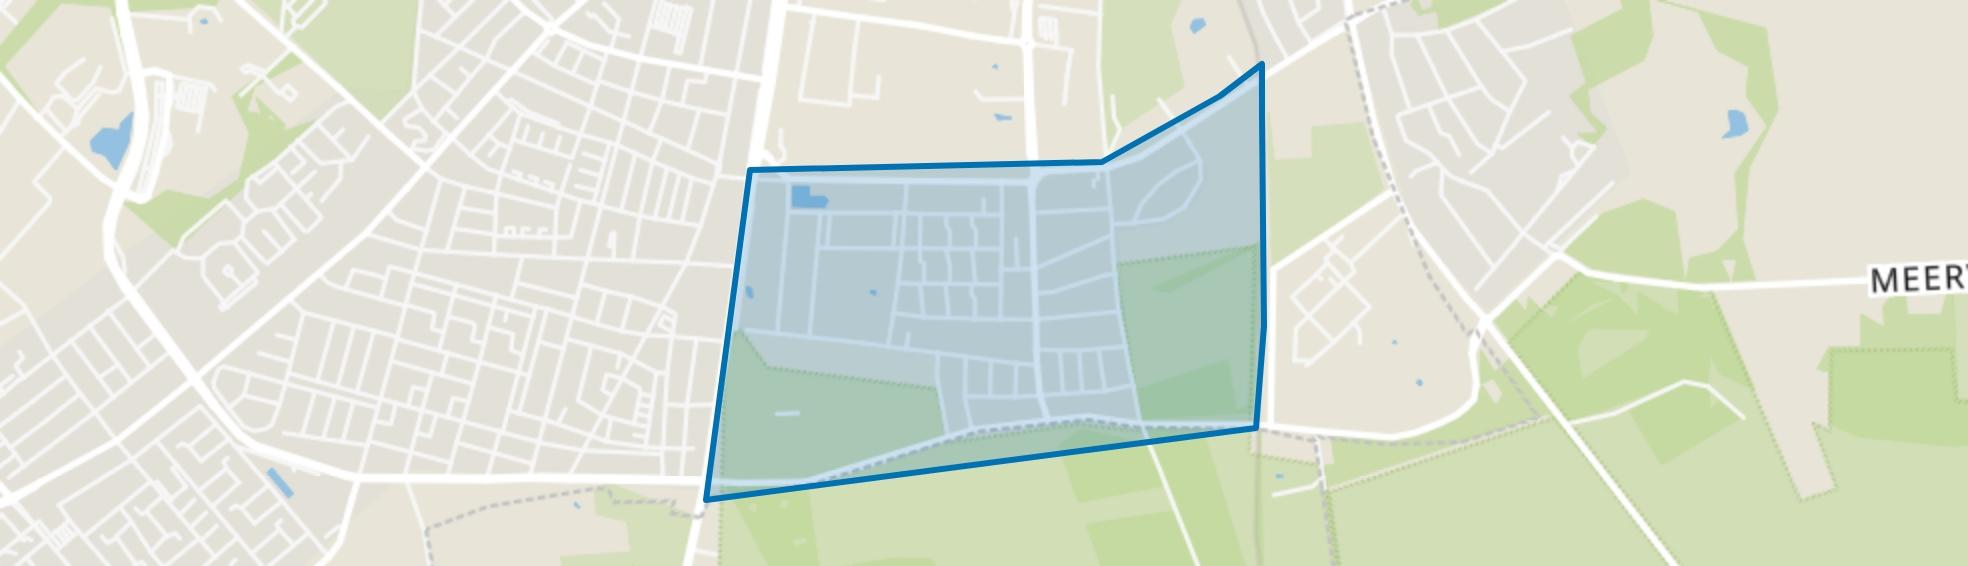 Brakkenstein, Nijmegen map